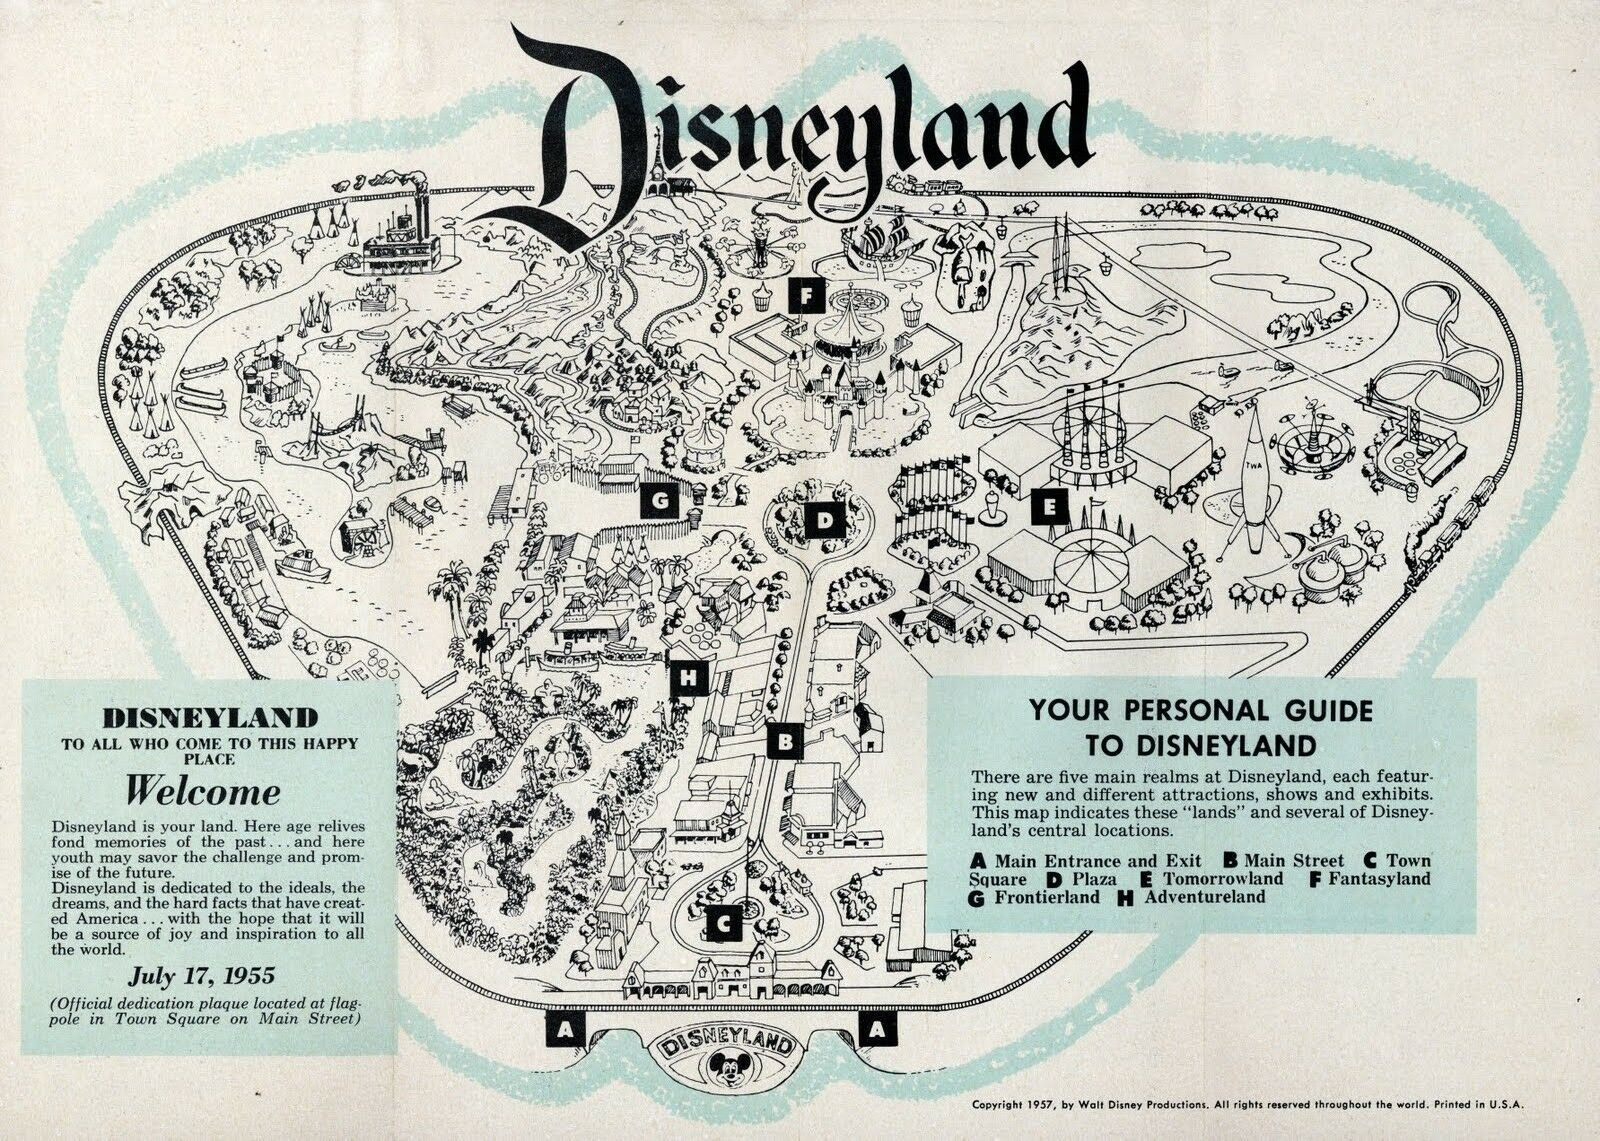 1957 Disneyland Map POSTER 24 X 36 Inches Looks beautiful Nostalgia - $19.94